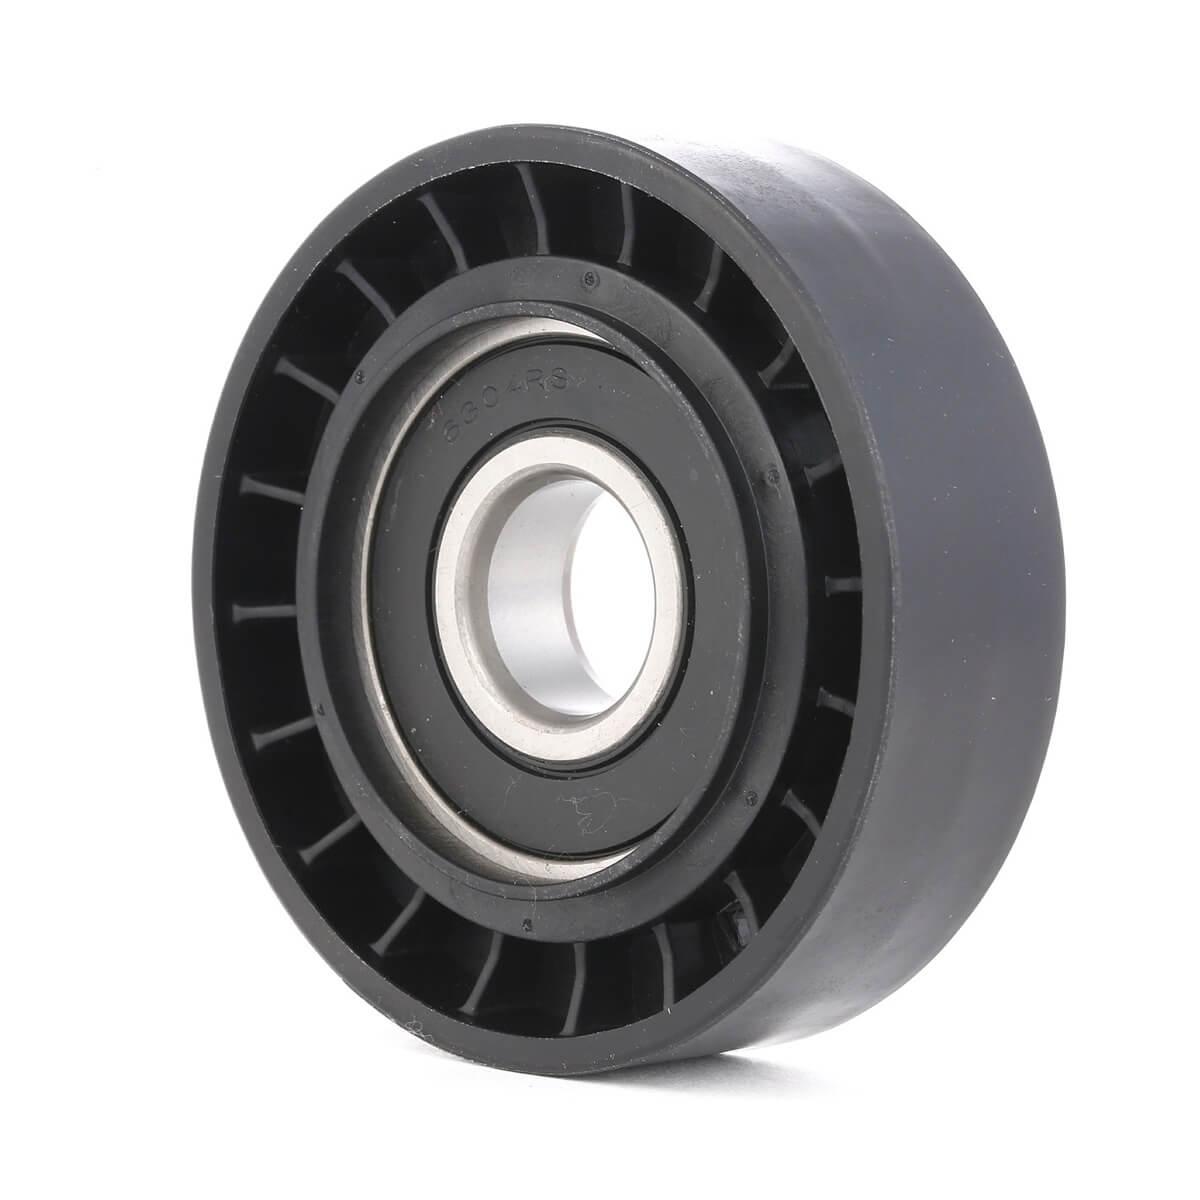 Auxillary Drive Poly V Belt Deflection/G